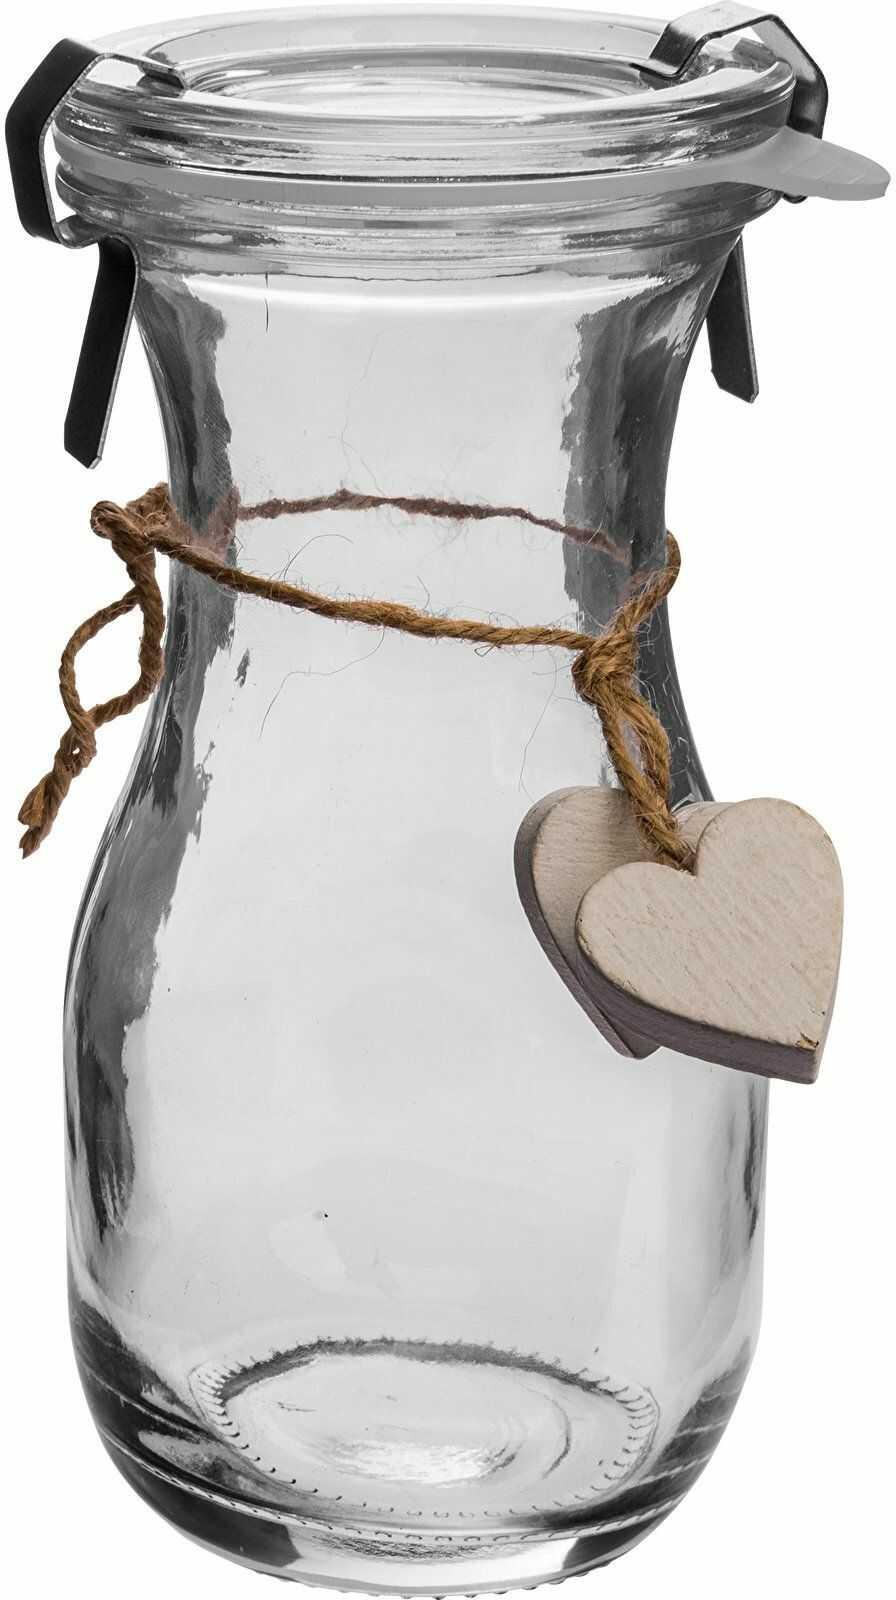 Butelka Od Serca - biała, z zamknięciem, 250ml